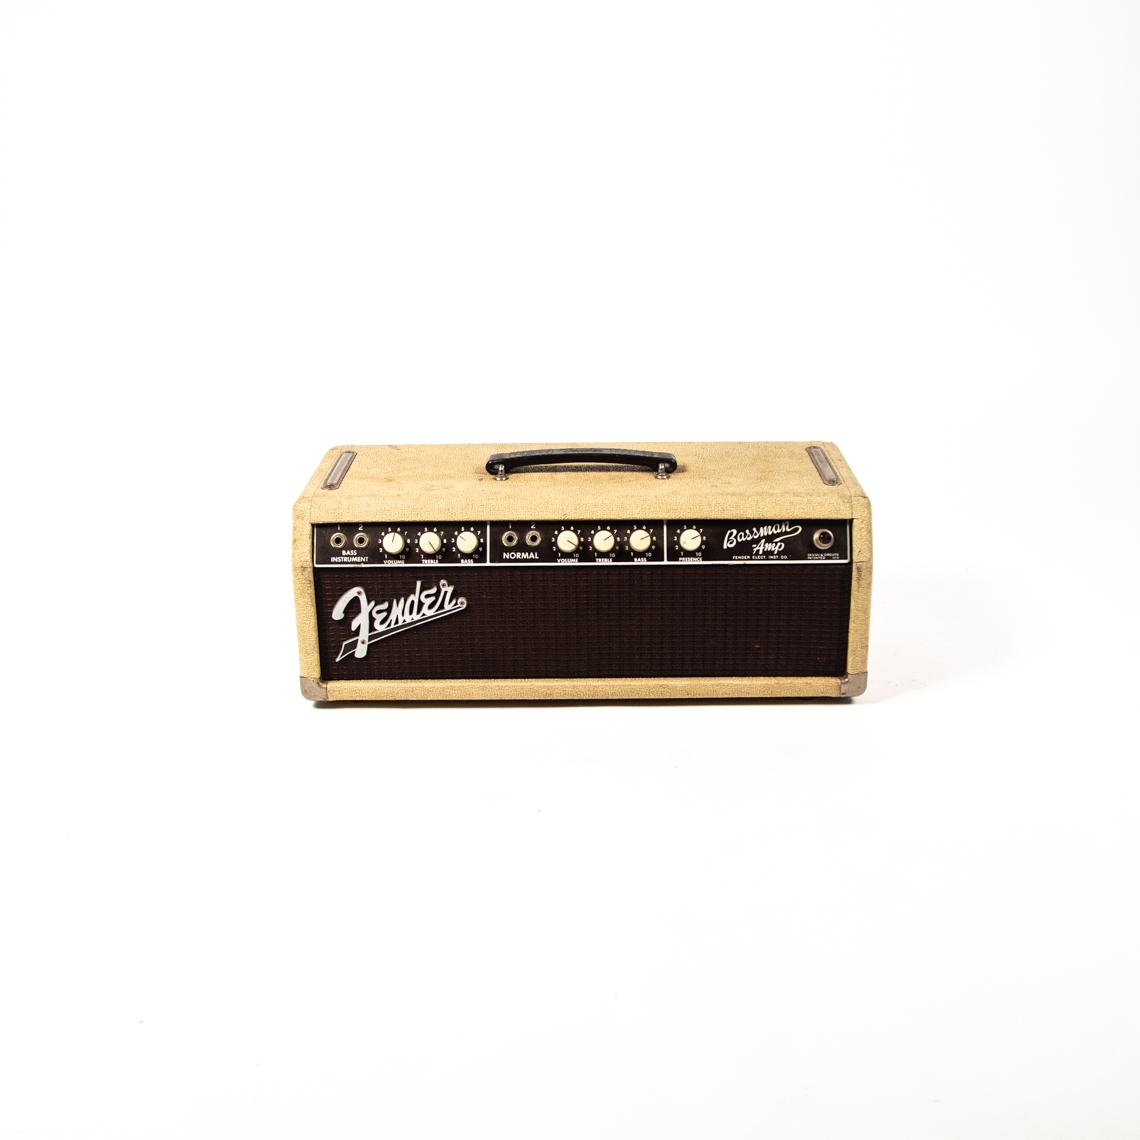 Fender Bassman